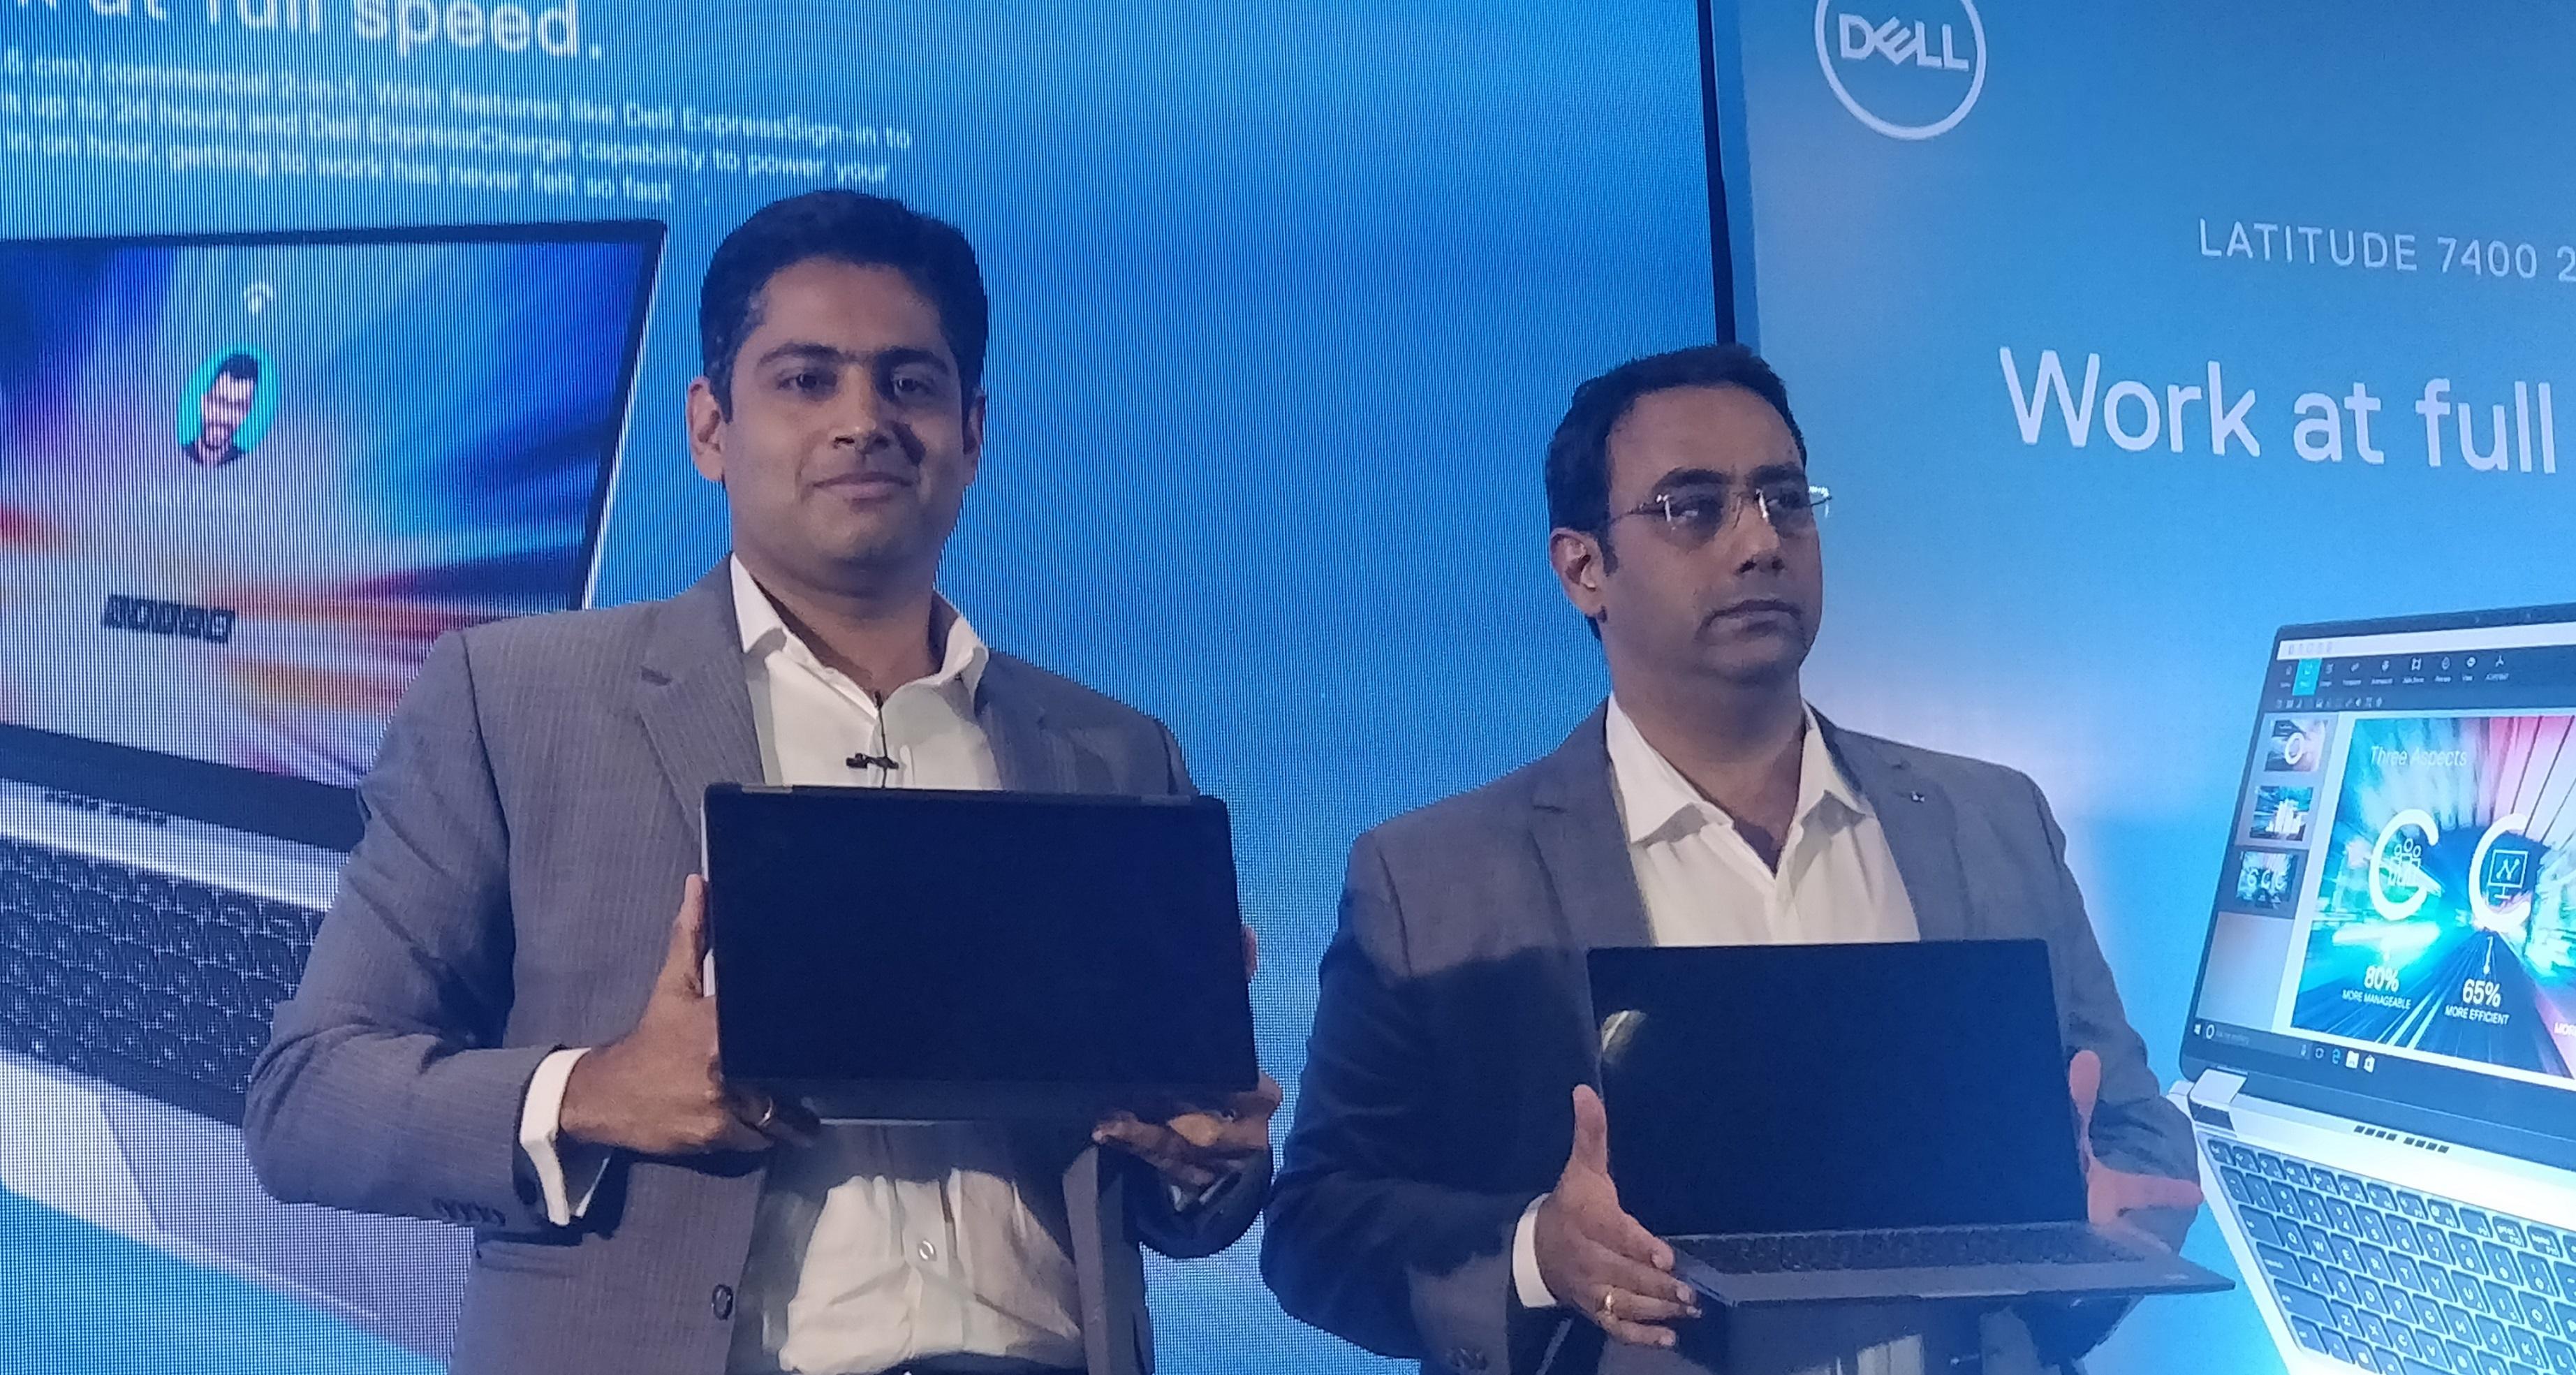 Vivekanand Manjeri and Indrajit Belgundi launcing Dell latitude 7400 2-in-1 in India